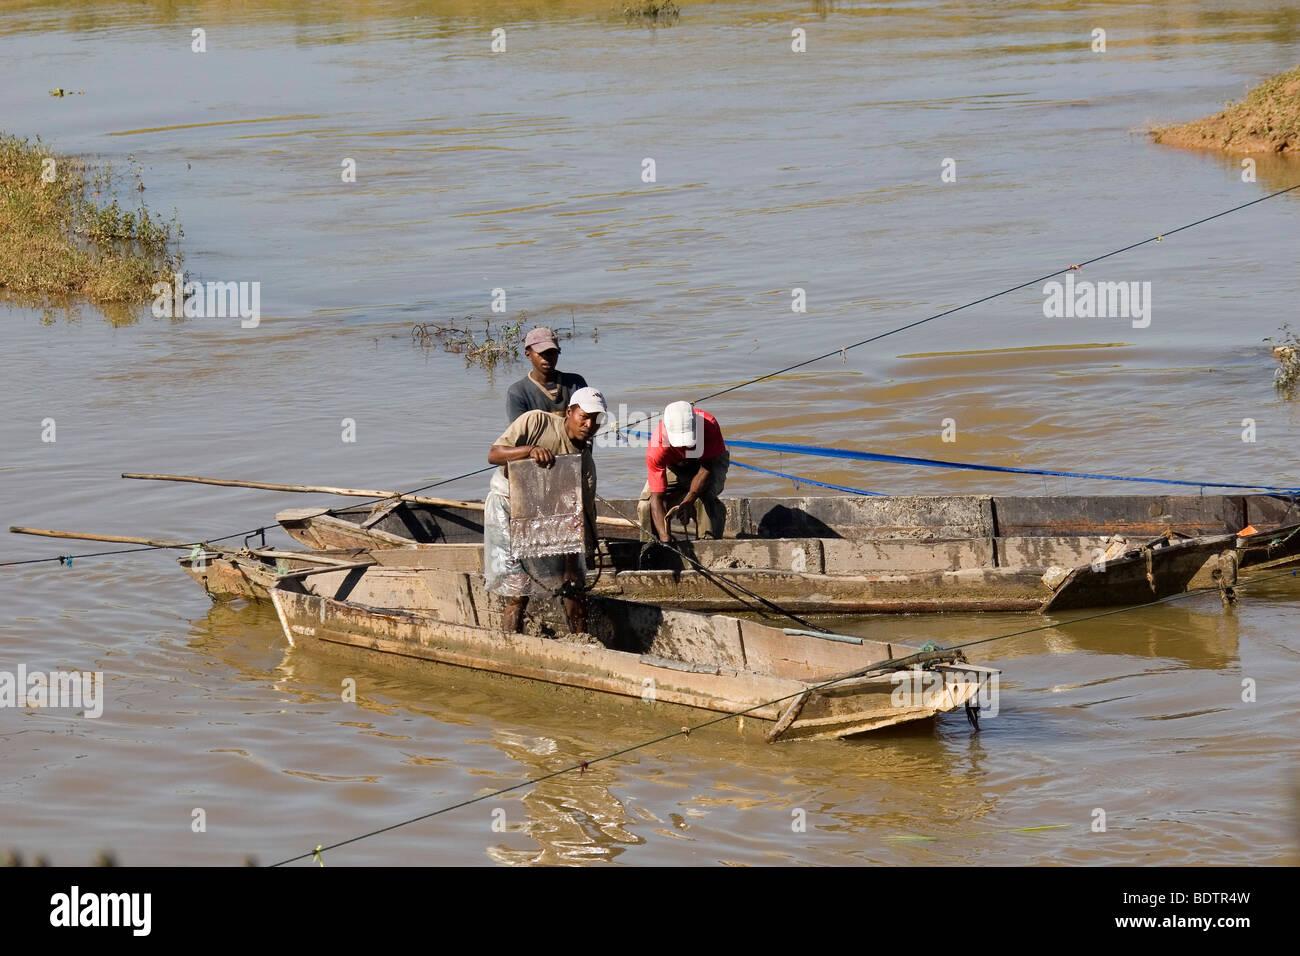 Flussarbeiter bei Antananarivo, Madagaskar, Afrika, river, worker, river workers, Madagascar, Africa - Stock Image